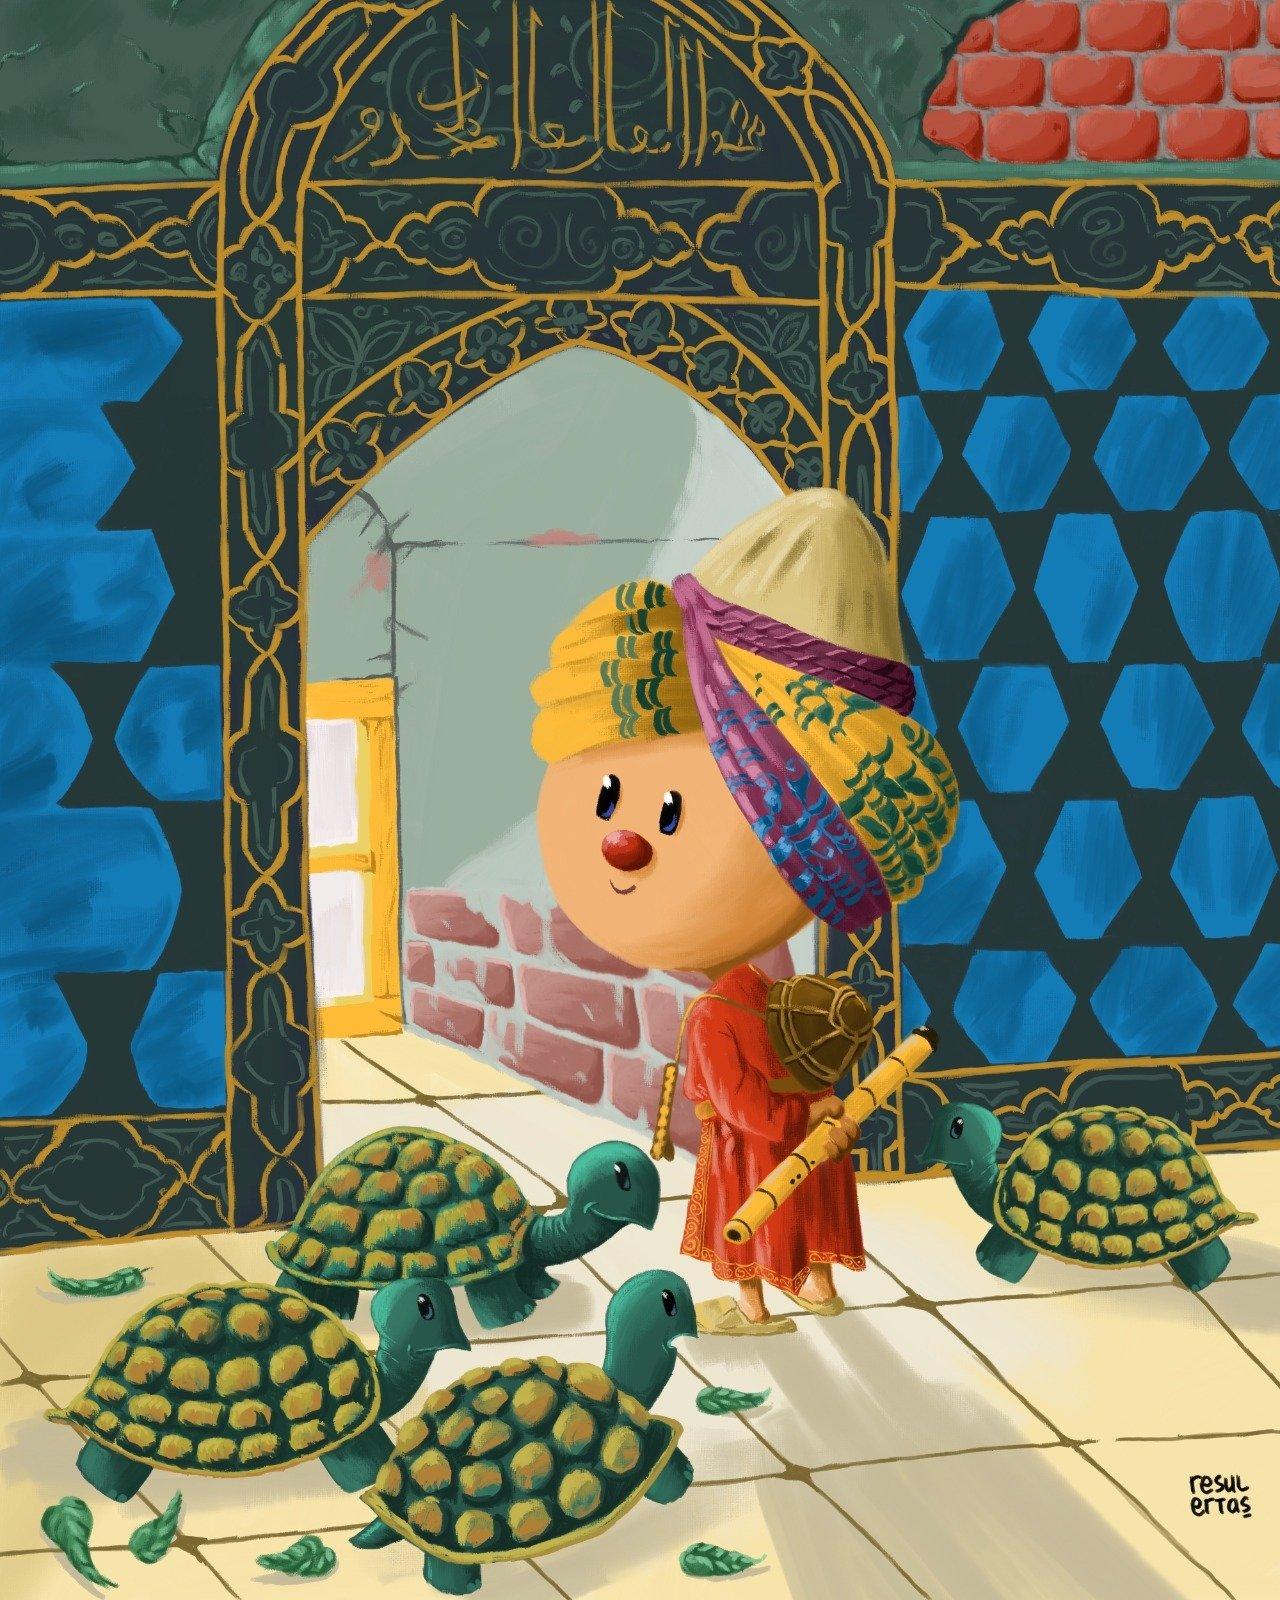 A cartoon by Resul Ertaş reinterprets Ottoman painter Osman Hamdi Bey's 'The Tortoise Trainer.' (AA Photo)